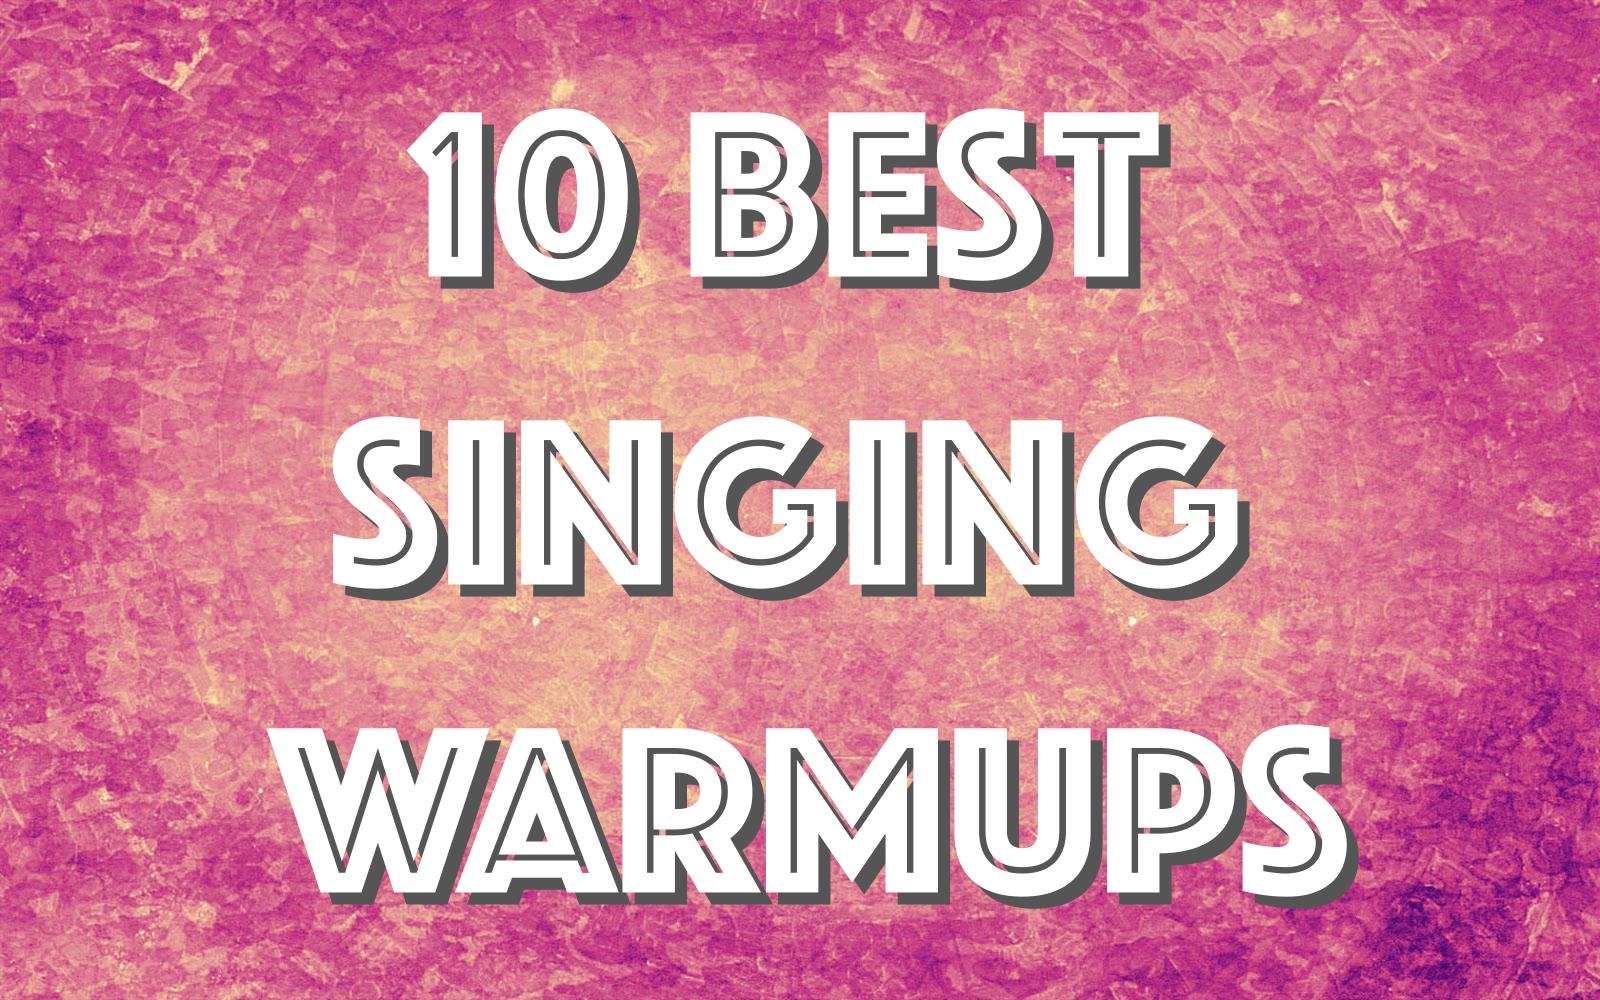 10 Best Singing Warmups